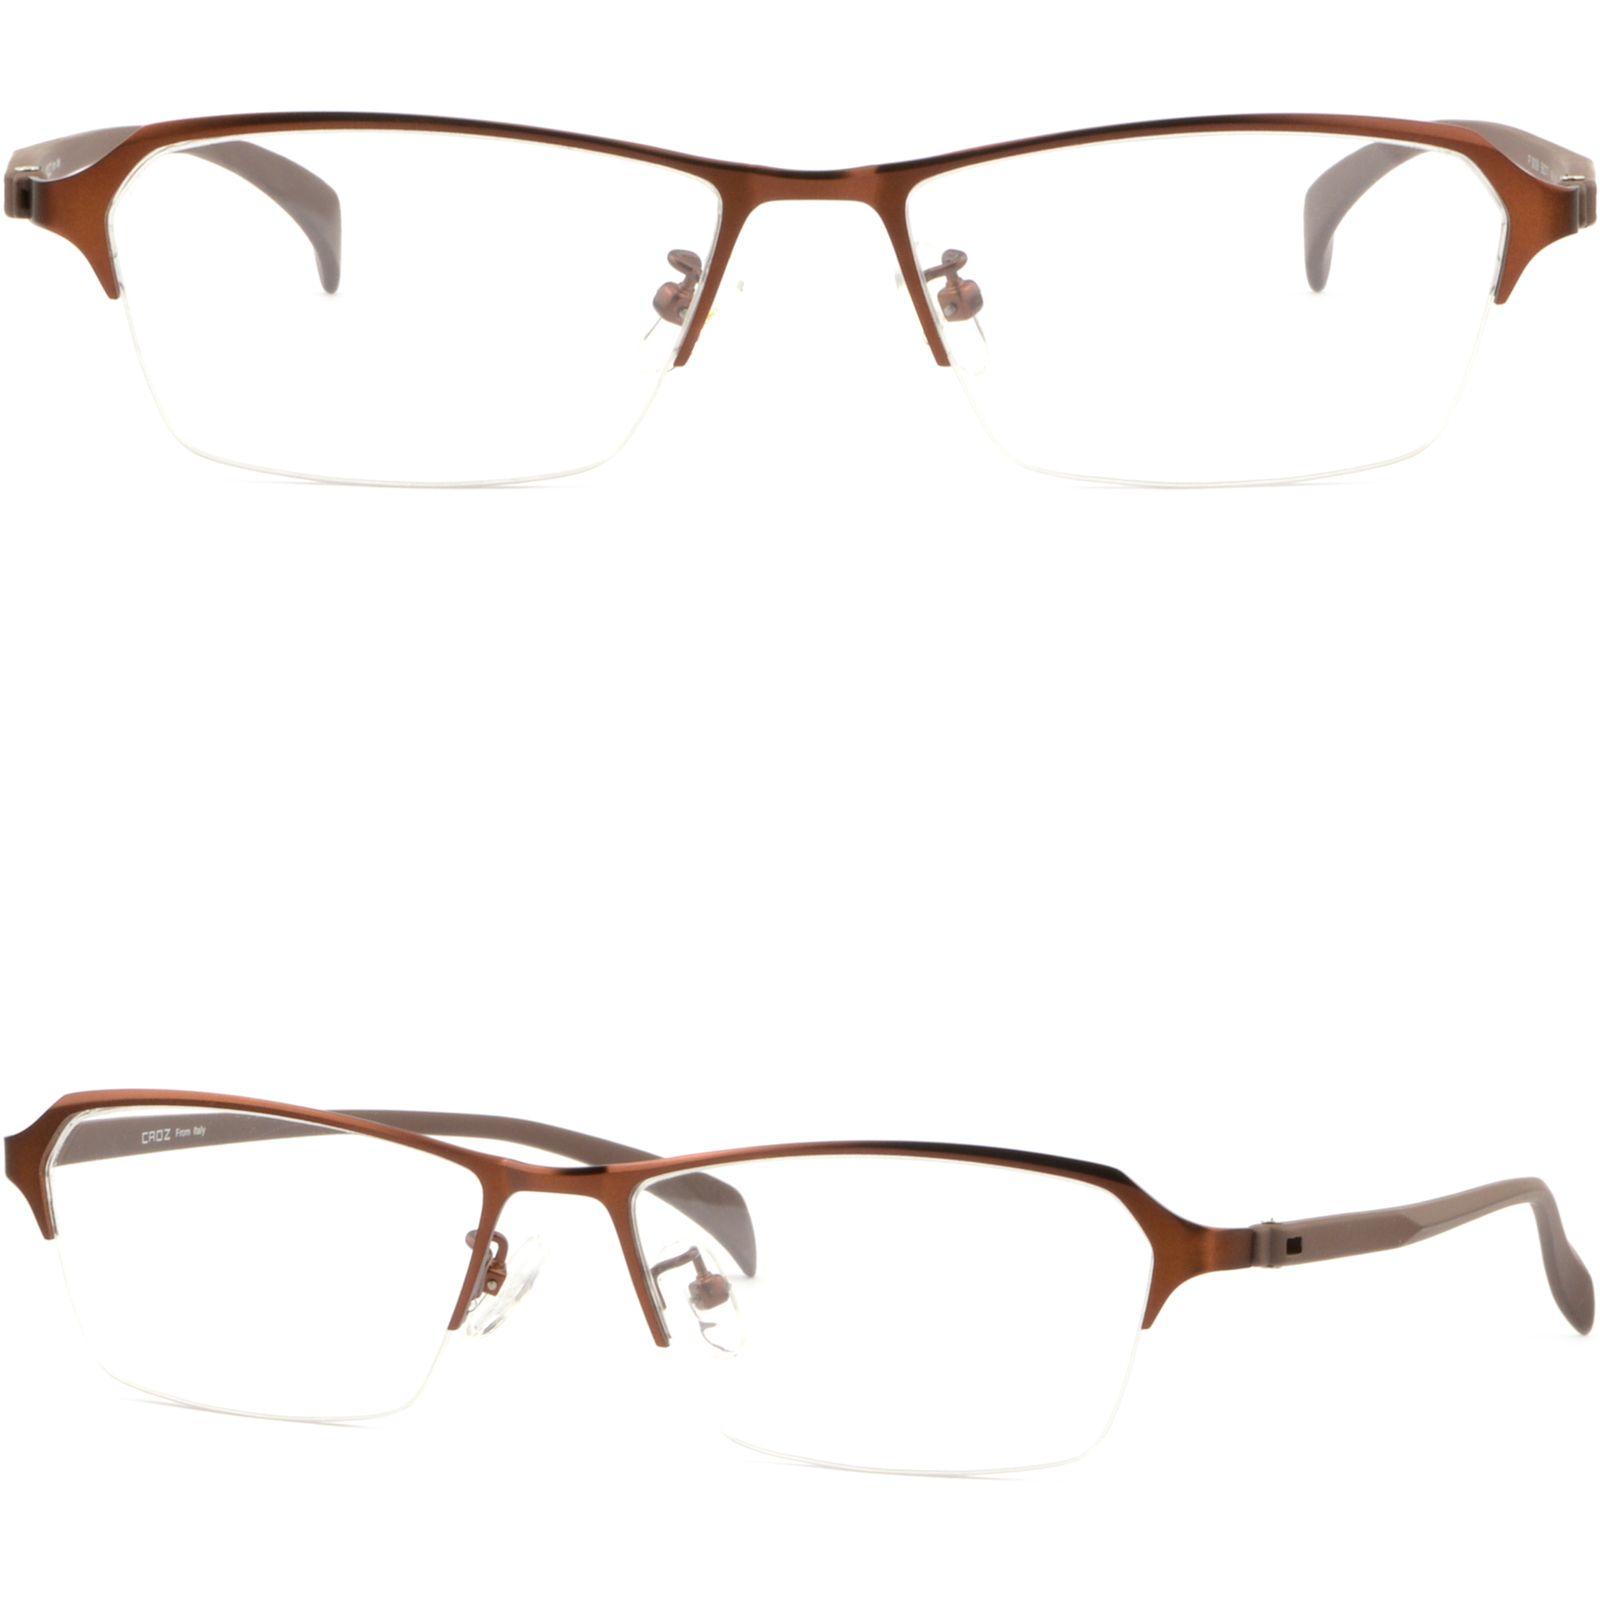 faee788622 Half Rim Men s Light Titanium Alloy Frame Prescription Glasses ...